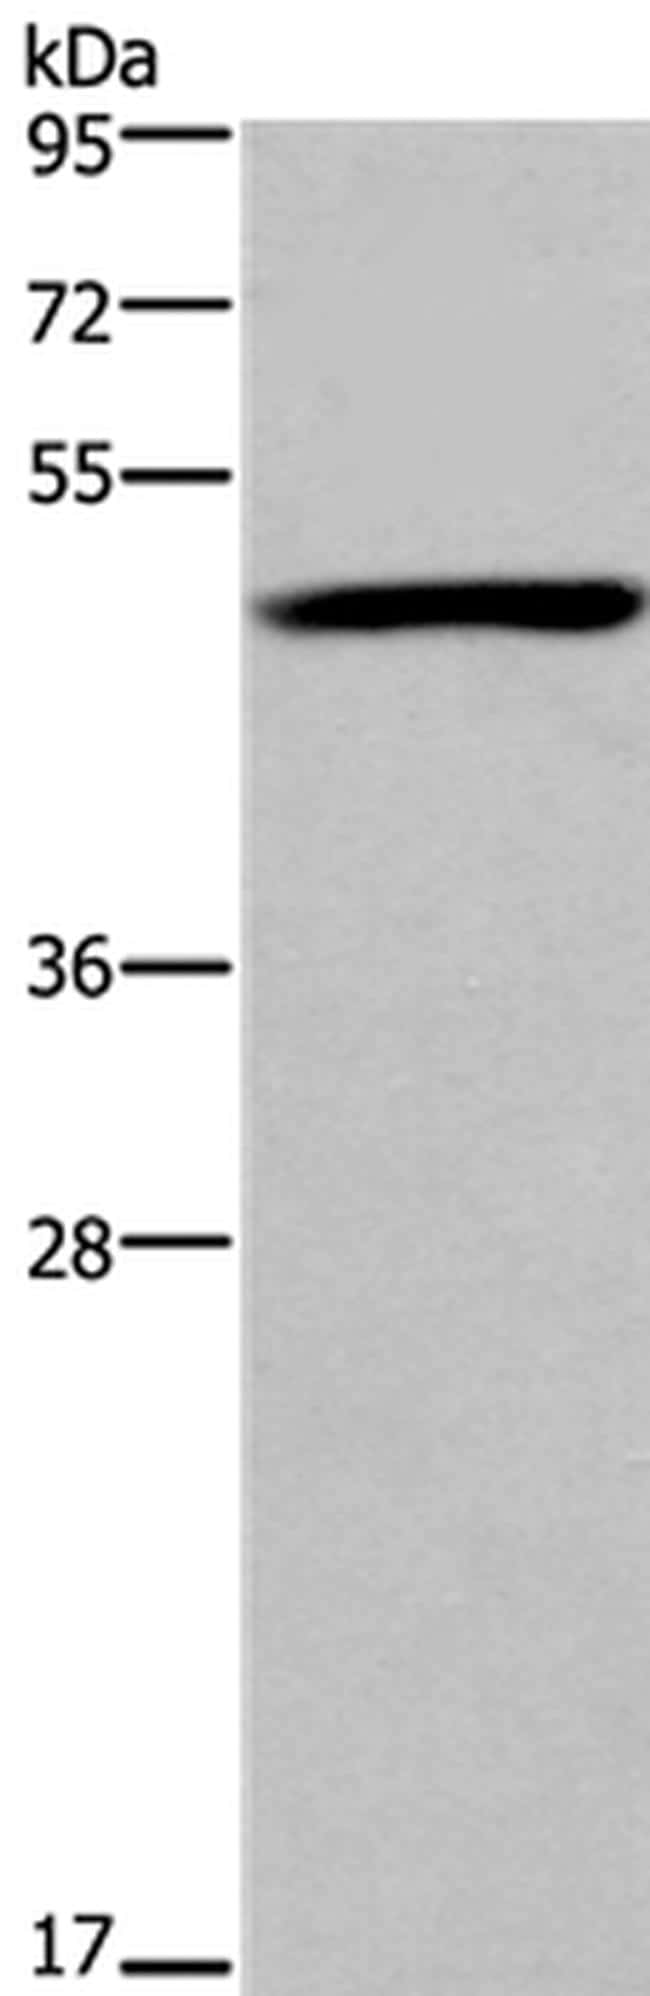 FOXD1 Antibody in Western Blot (WB)